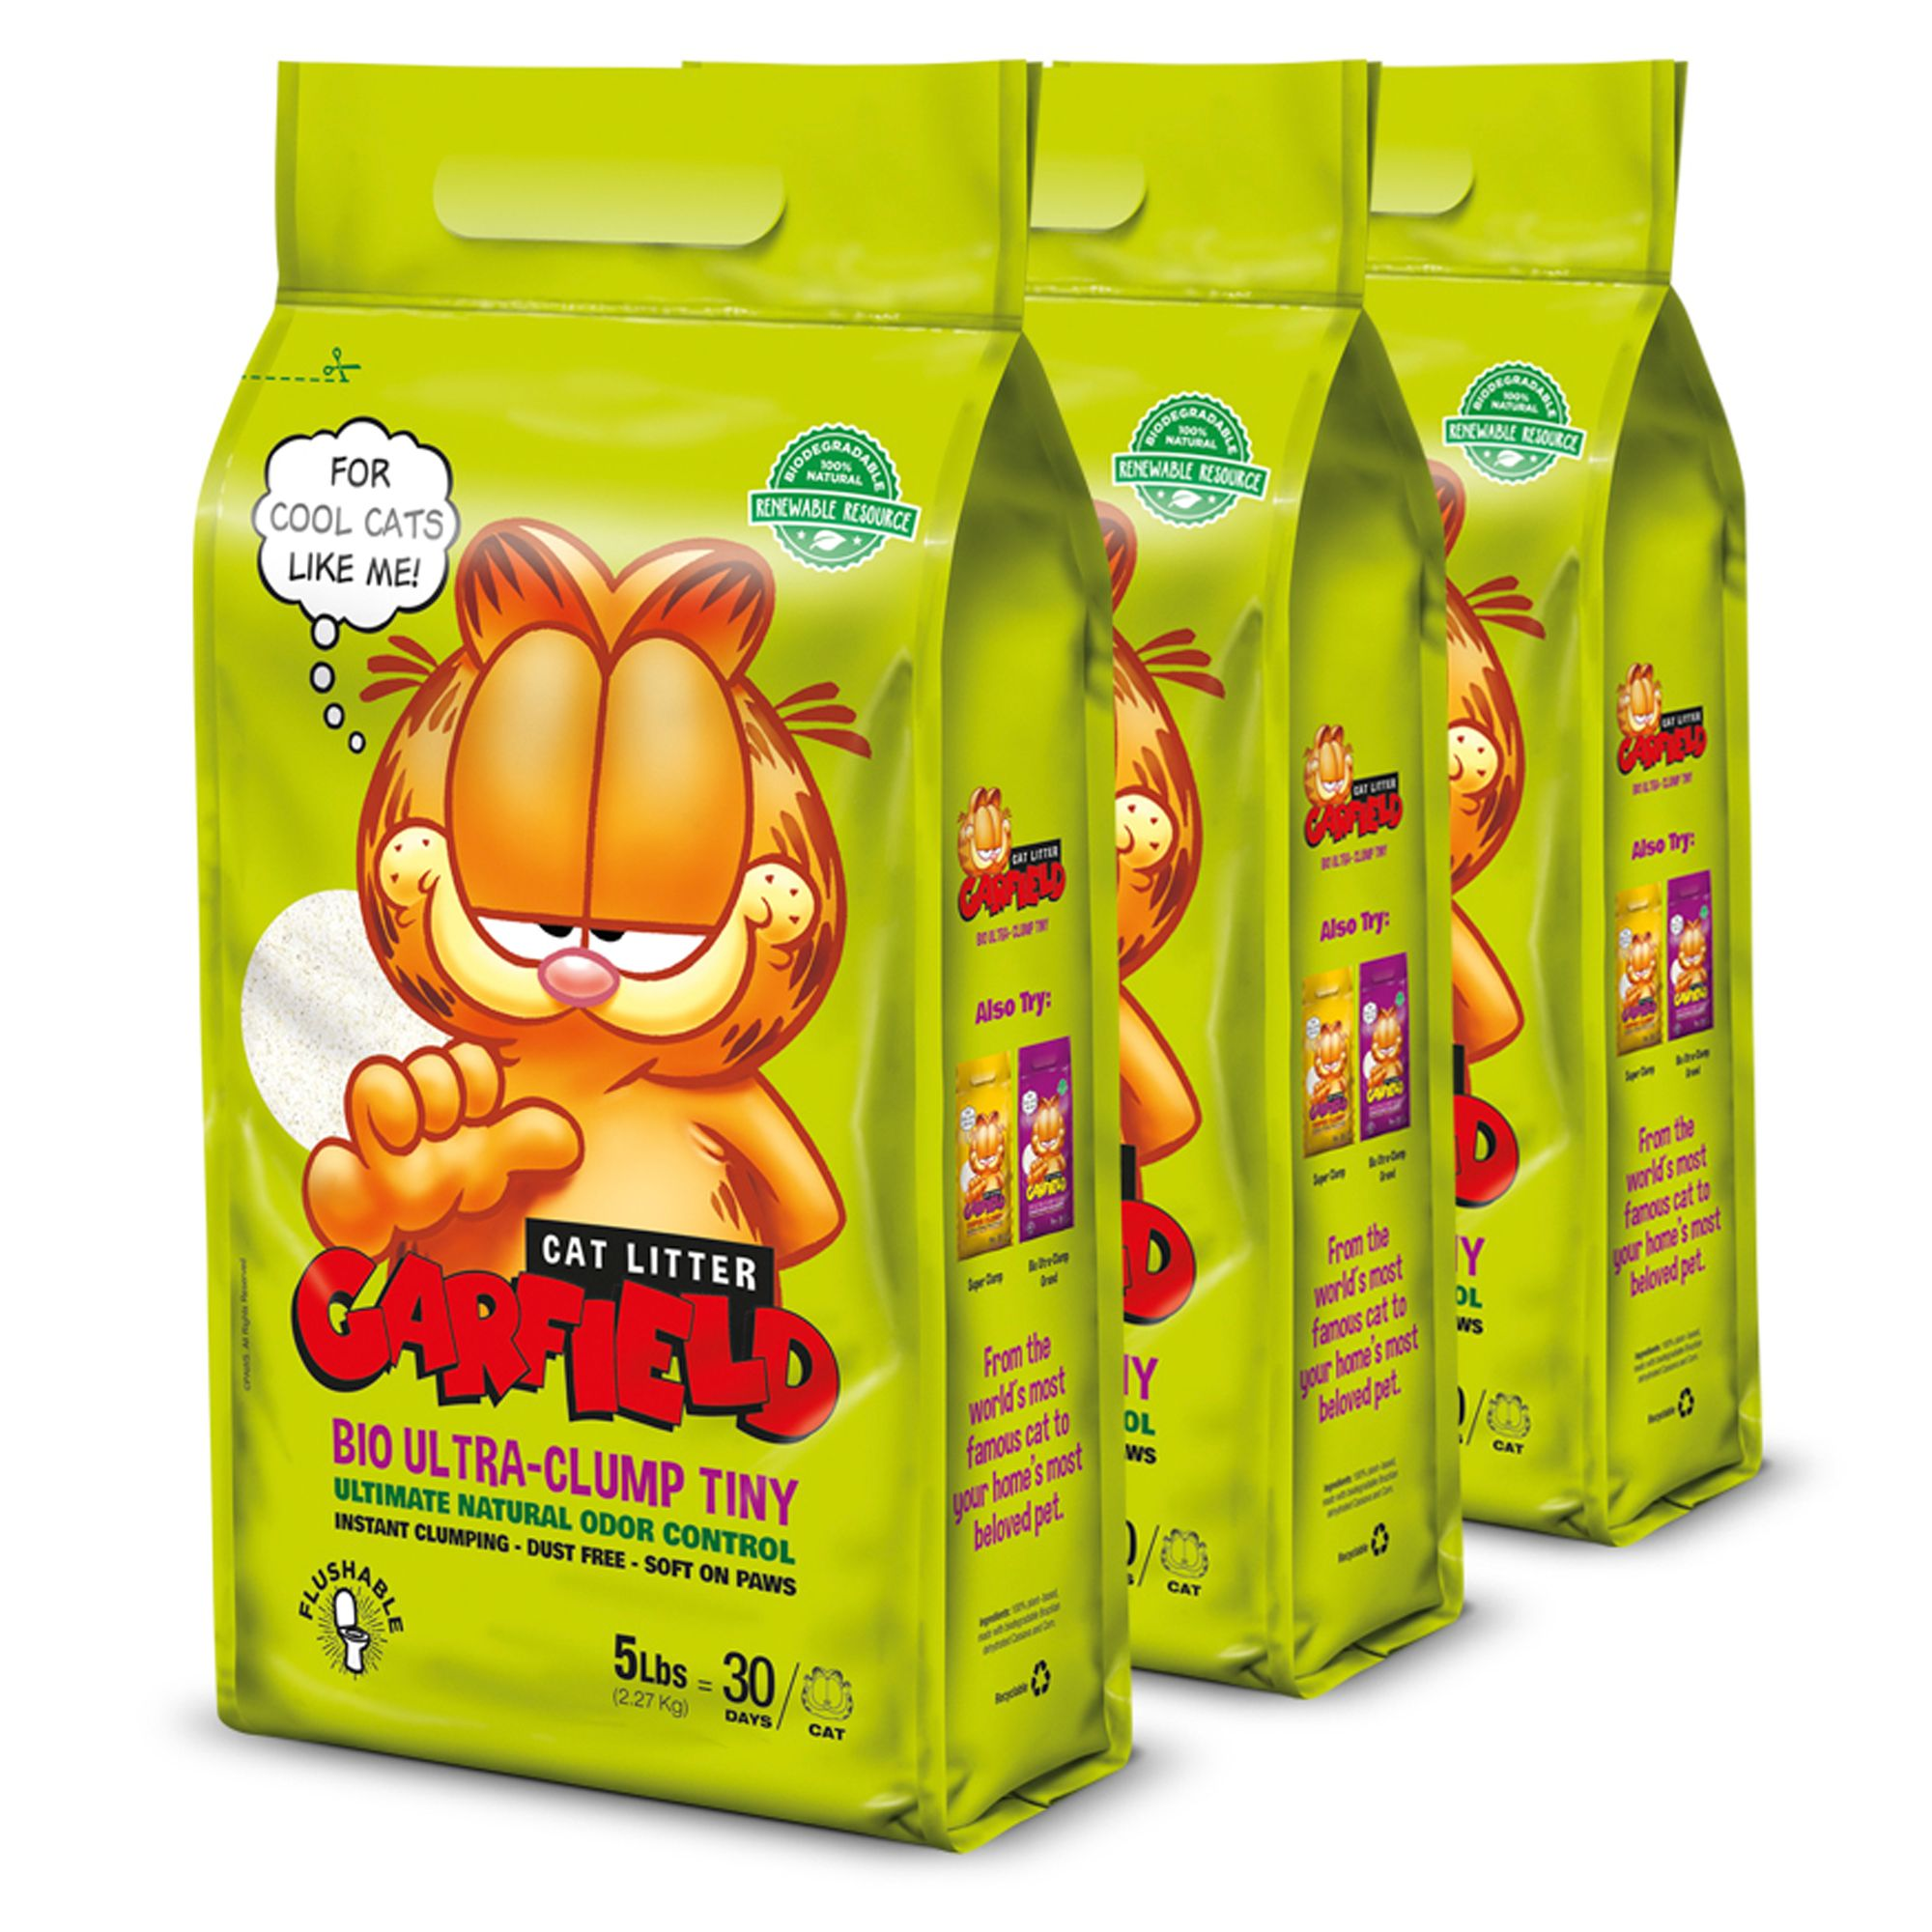 Garfield Bio Ultra Clump Tiny Cat Litter Natural Clumping 3 Pack Size 15 Lb